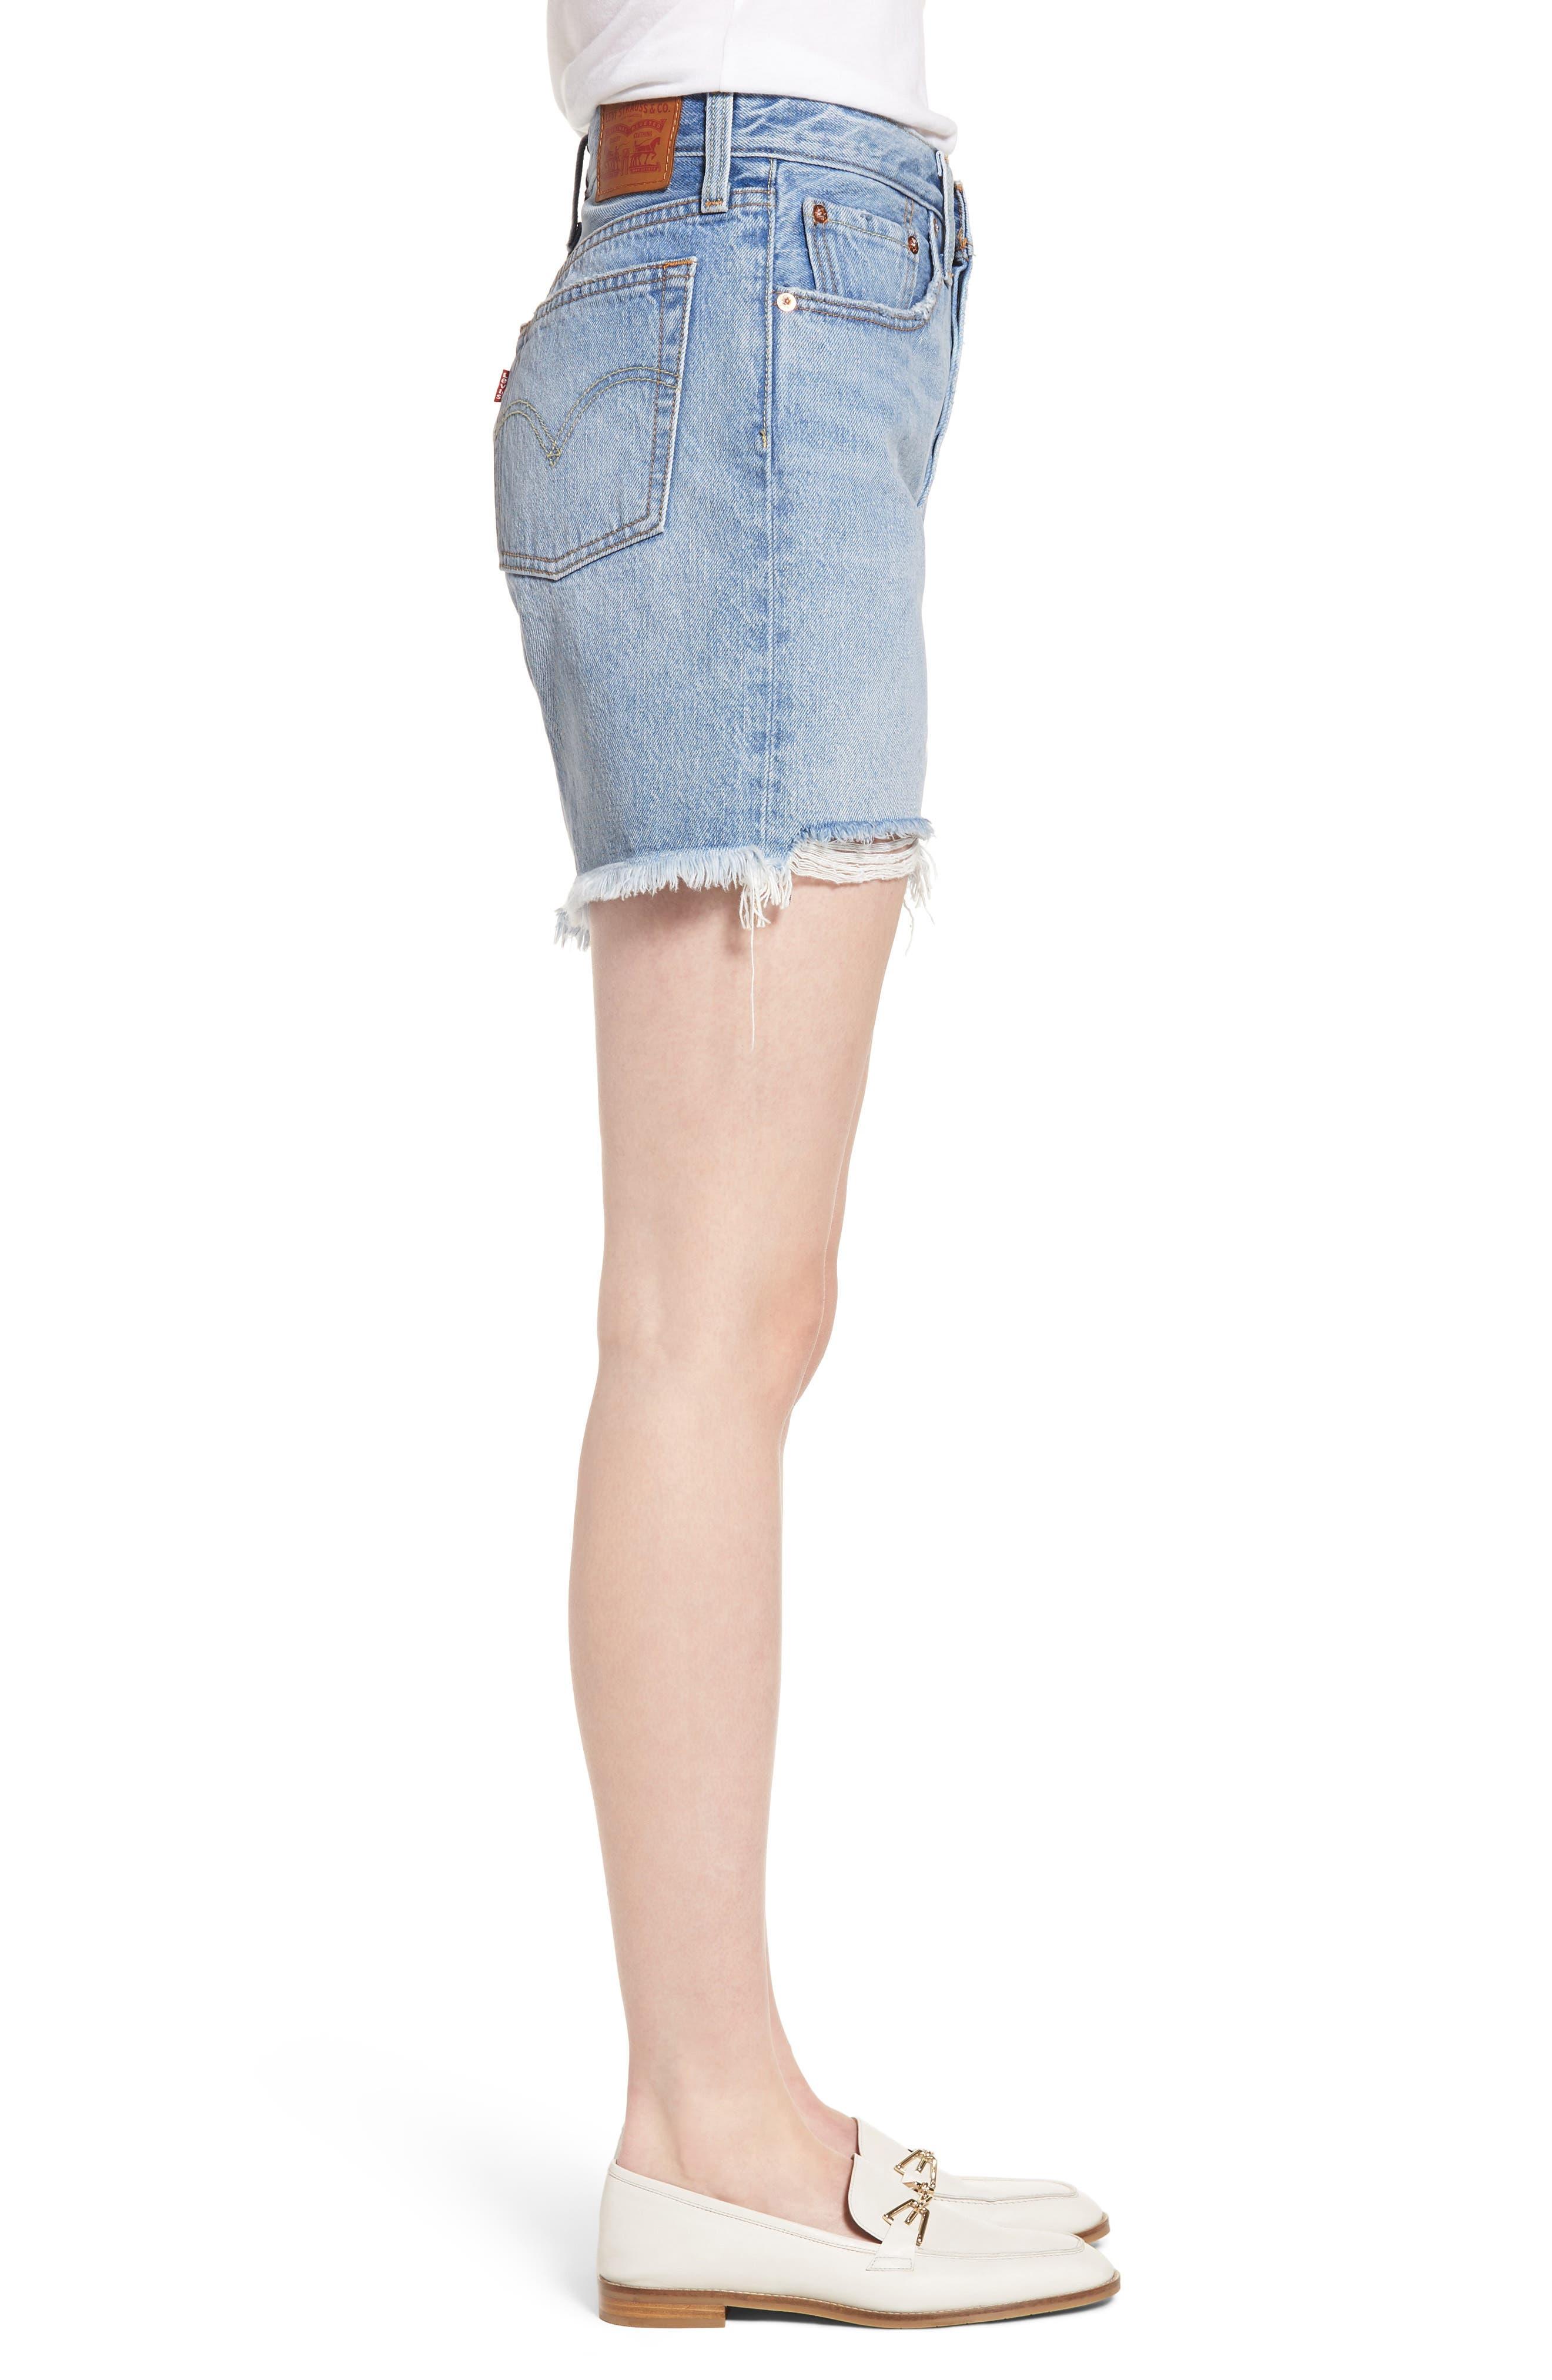 Indie Shredded Shorts,                             Alternate thumbnail 3, color,                             420